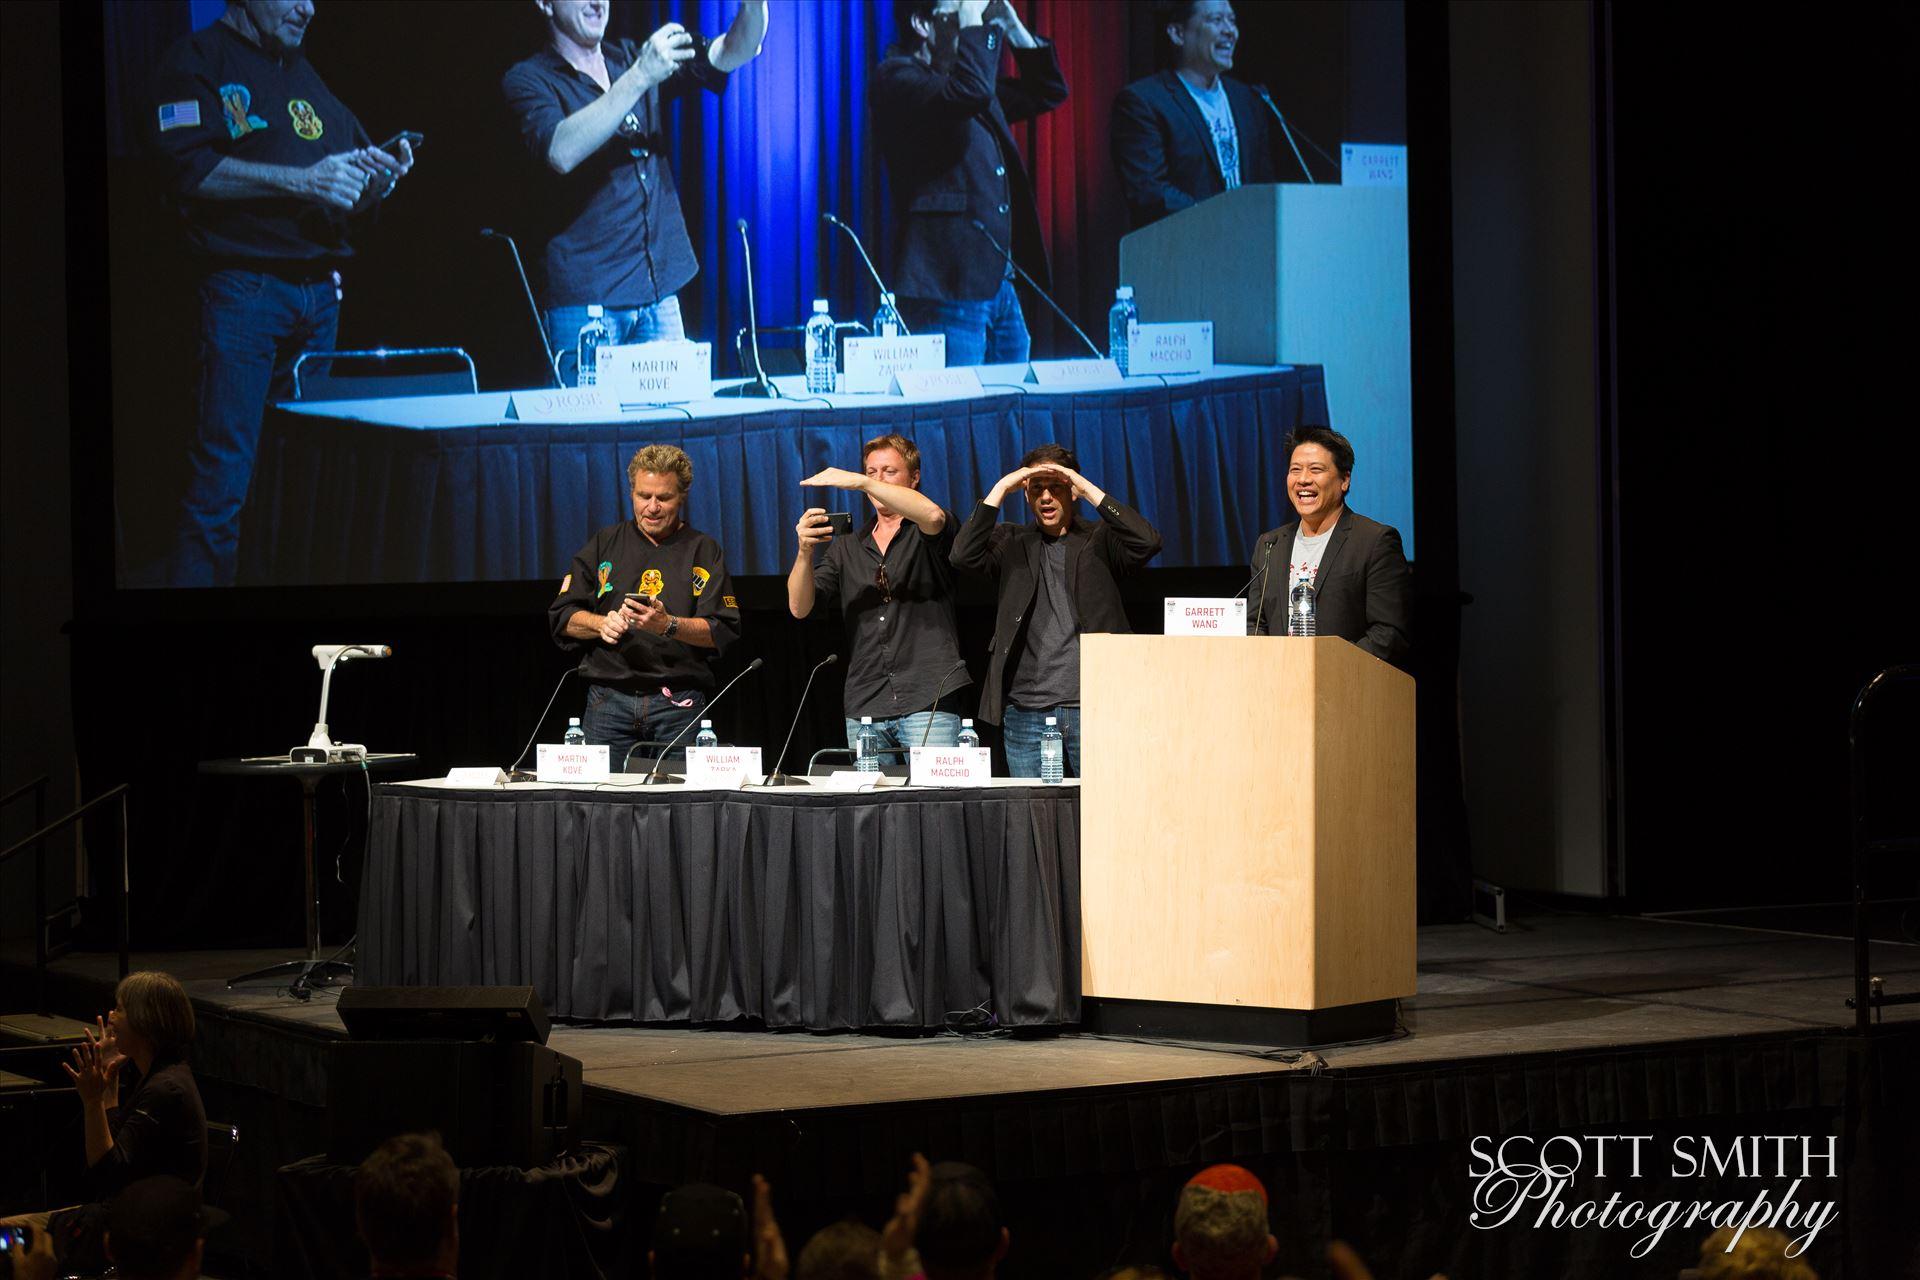 Denver Comic Con 2016 35 - Denver Comic Con 2016 at the Colorado Convention Center. Garrett Wang, Ralph Macchio, Martin Kove and William Zabka. by D Scott Smith